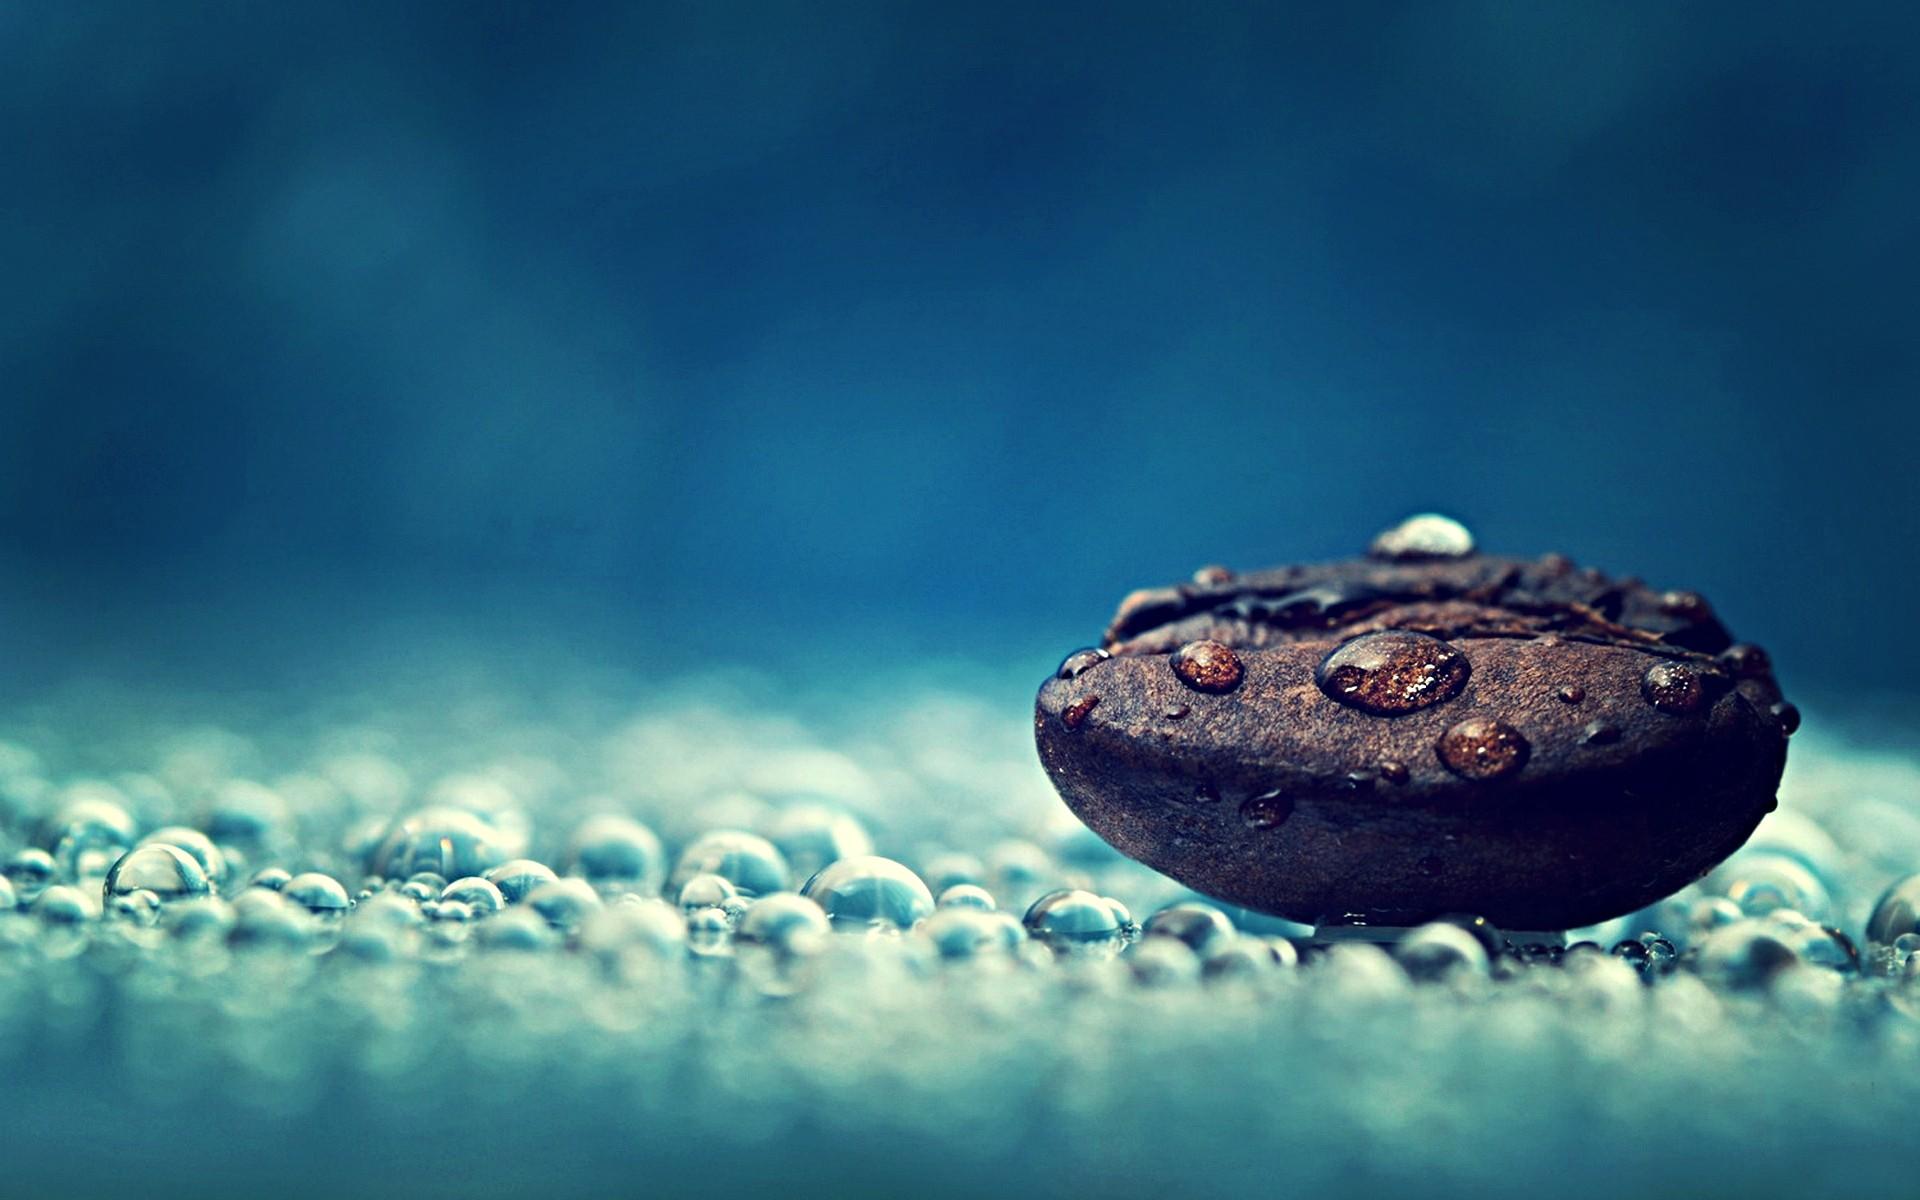 Coffee Photography Water Drops Macro Seeds Dew HD Wallpaper